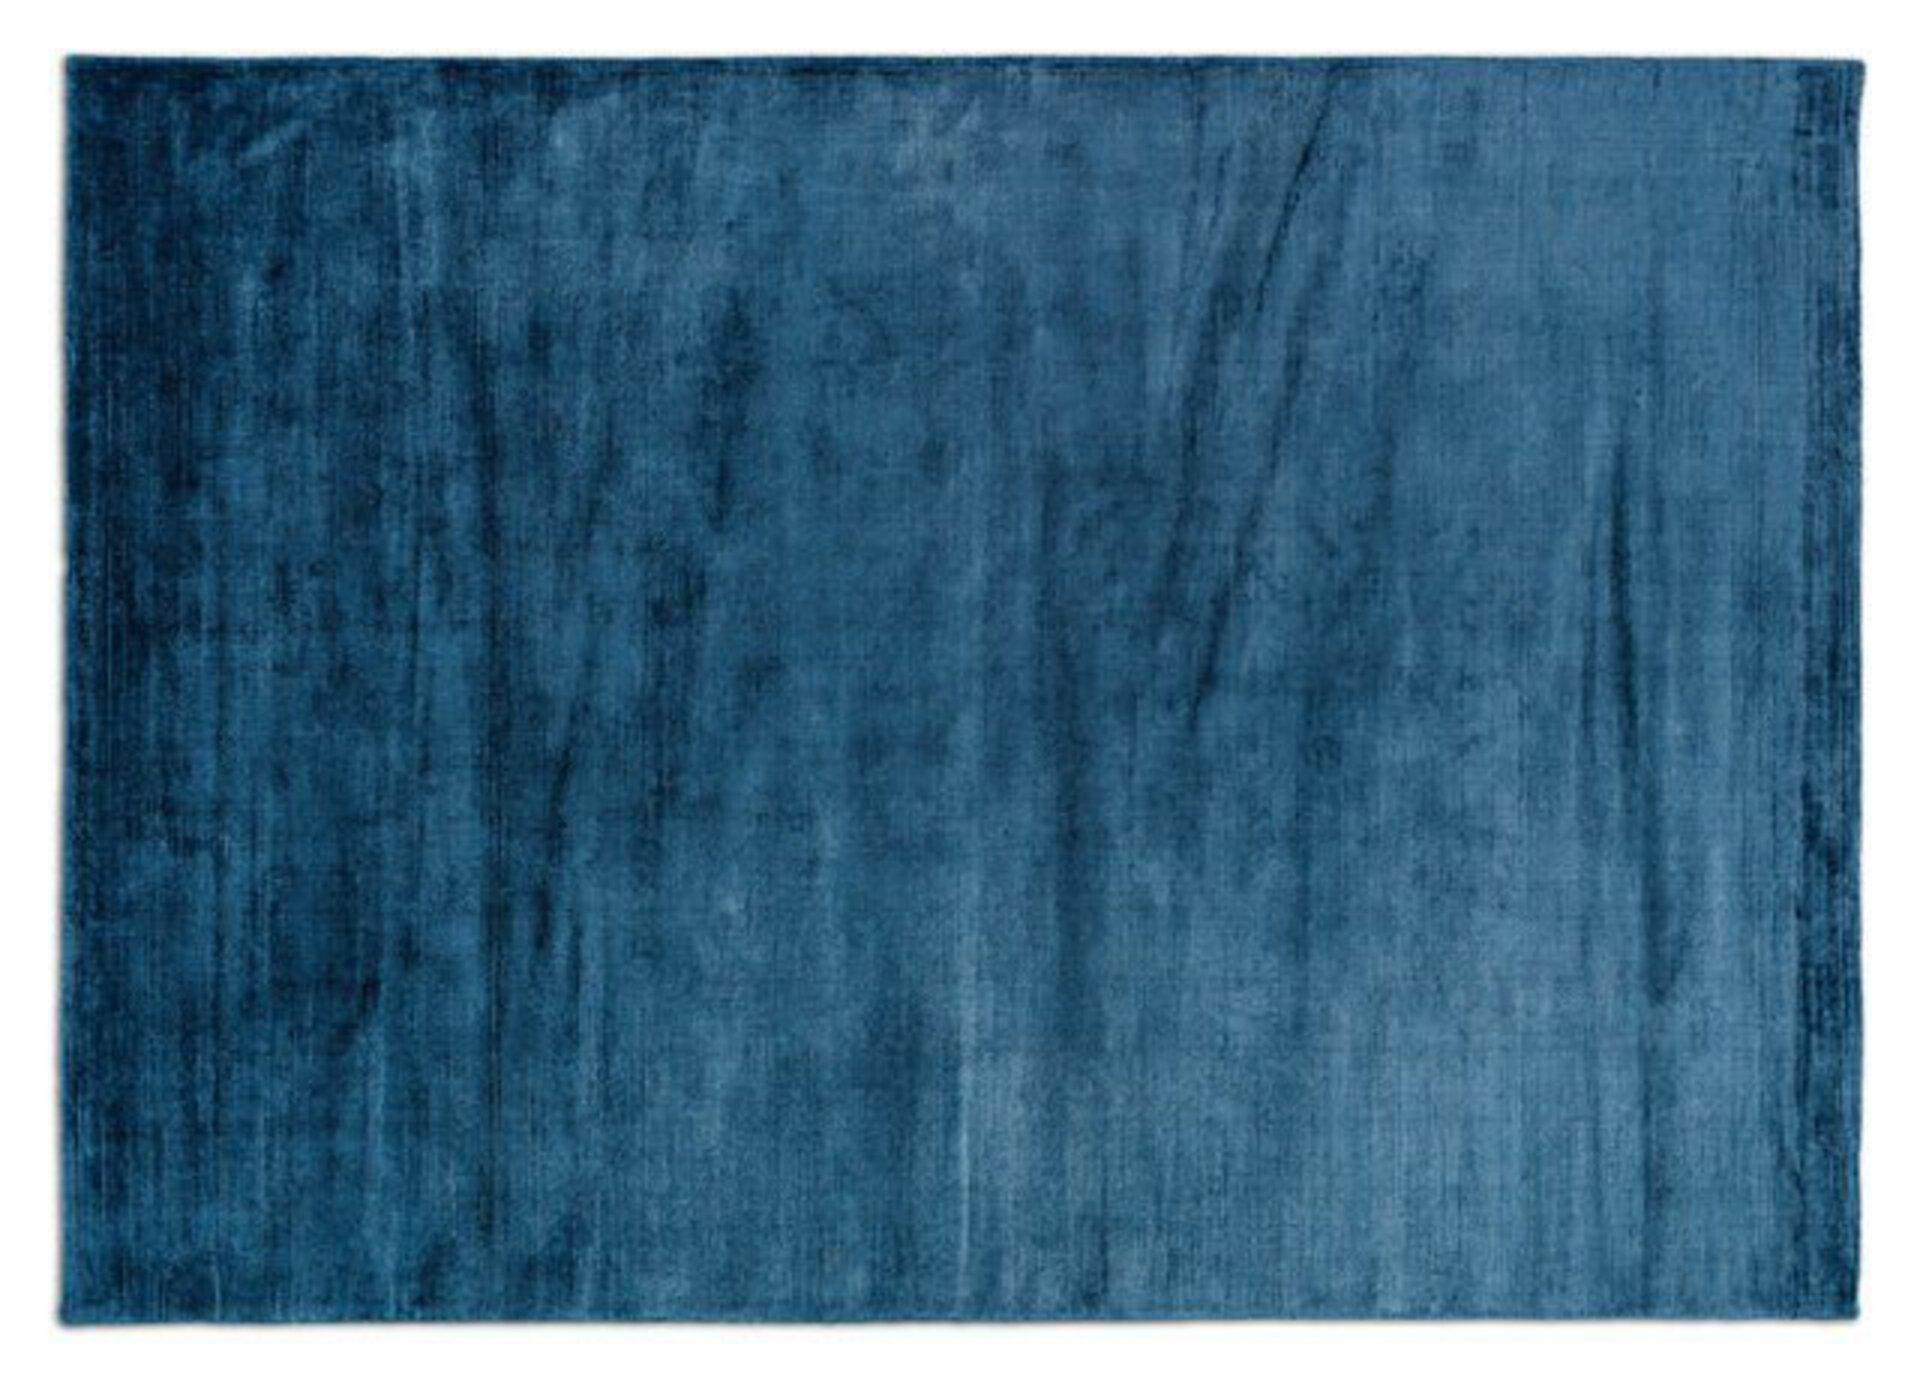 Maschinenwebteppich Soft Joop! Textil Blau 2 x 2 cm